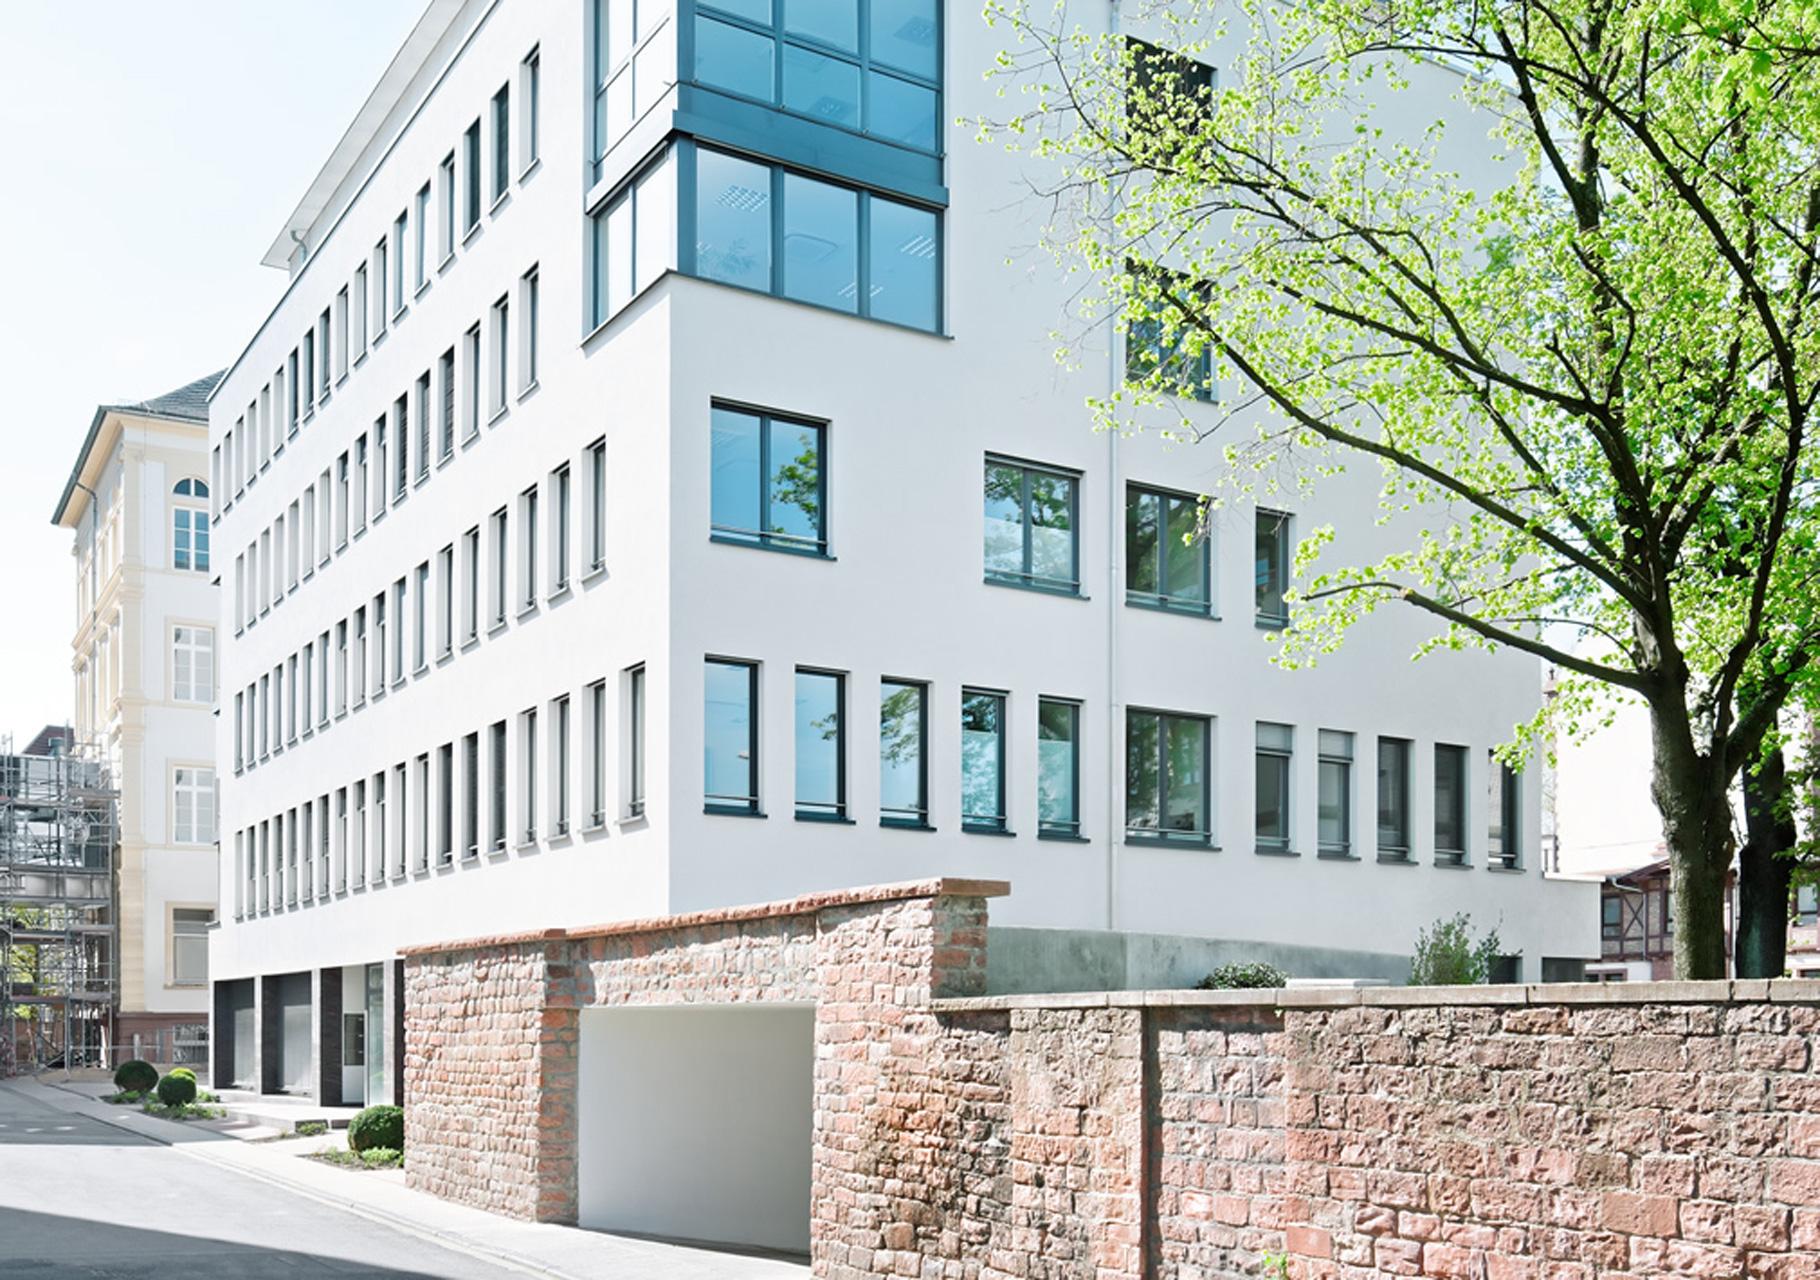 Bürogebäude Stadthaus am Neckar Heidelberg 2009